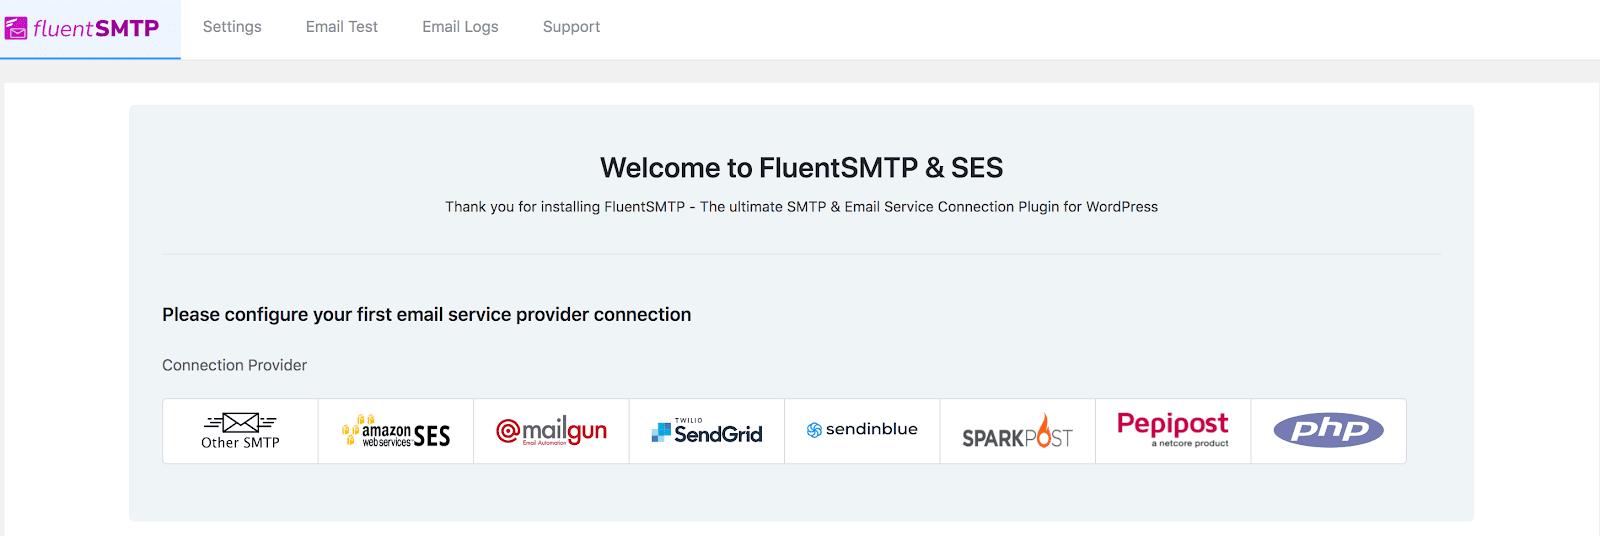 fluentsmtp configuration, fluentsmtp email services, fluentsmtp screenshot